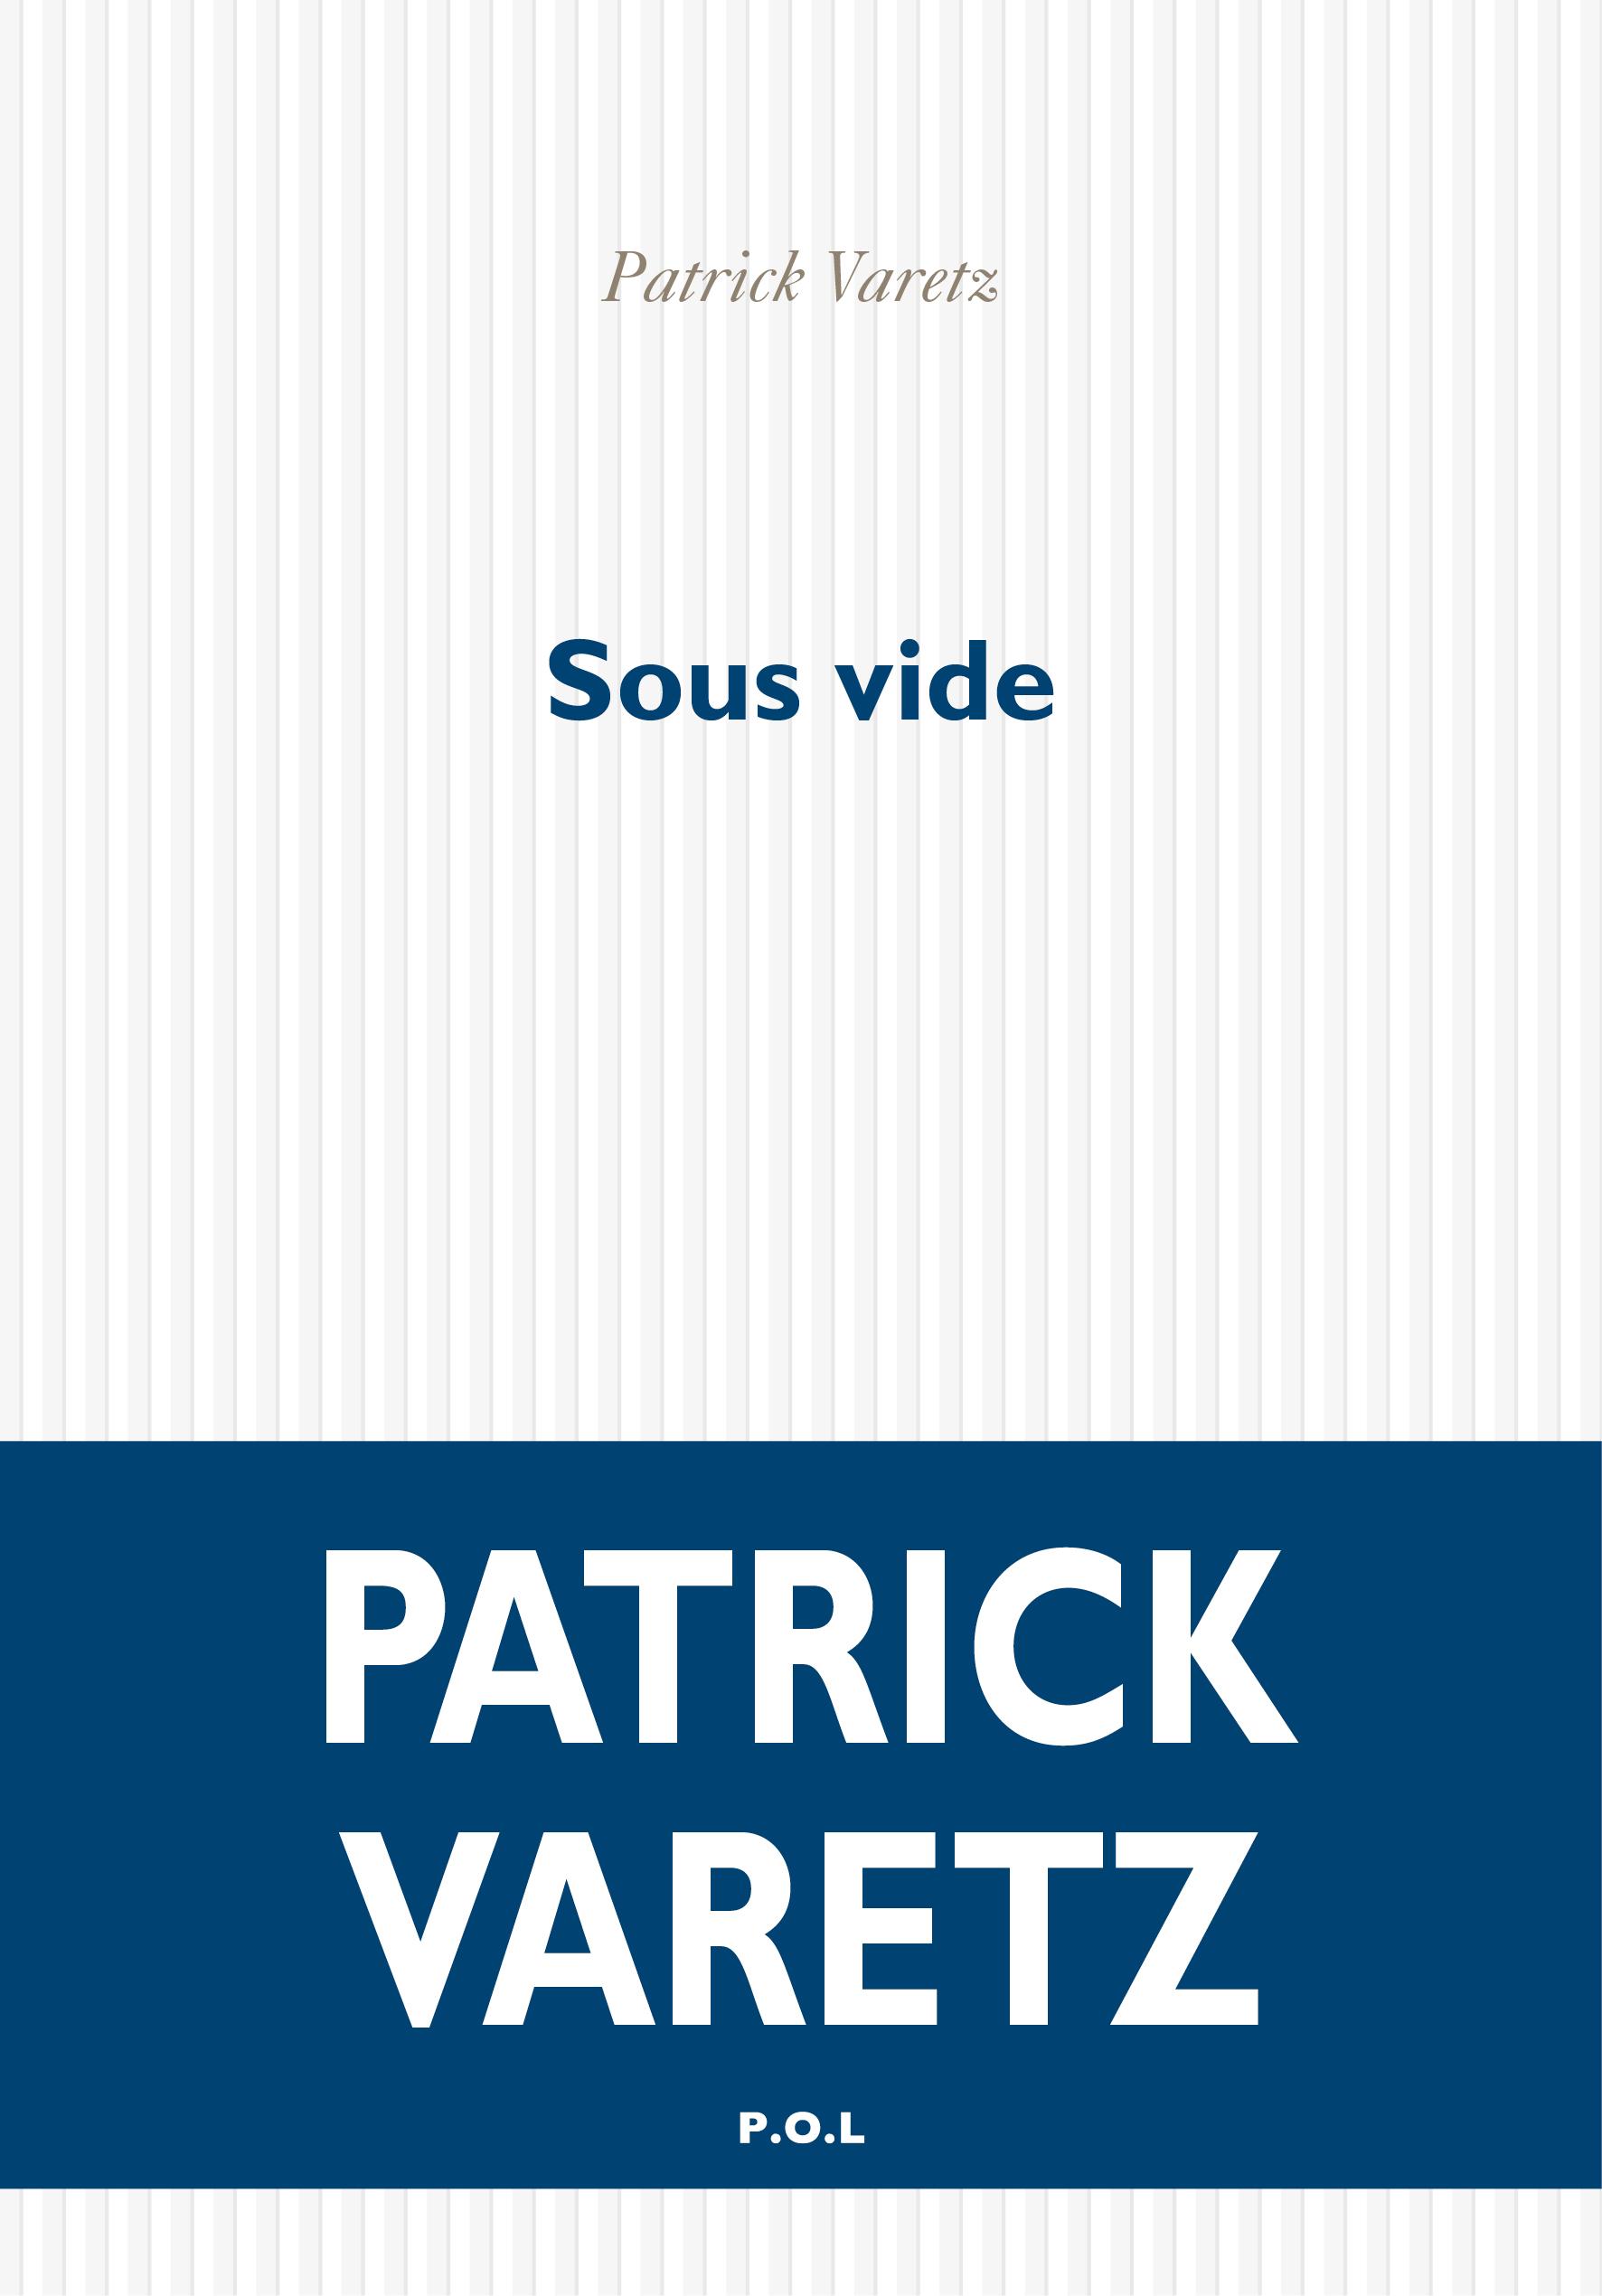 Sous vide, Patrick Varetz